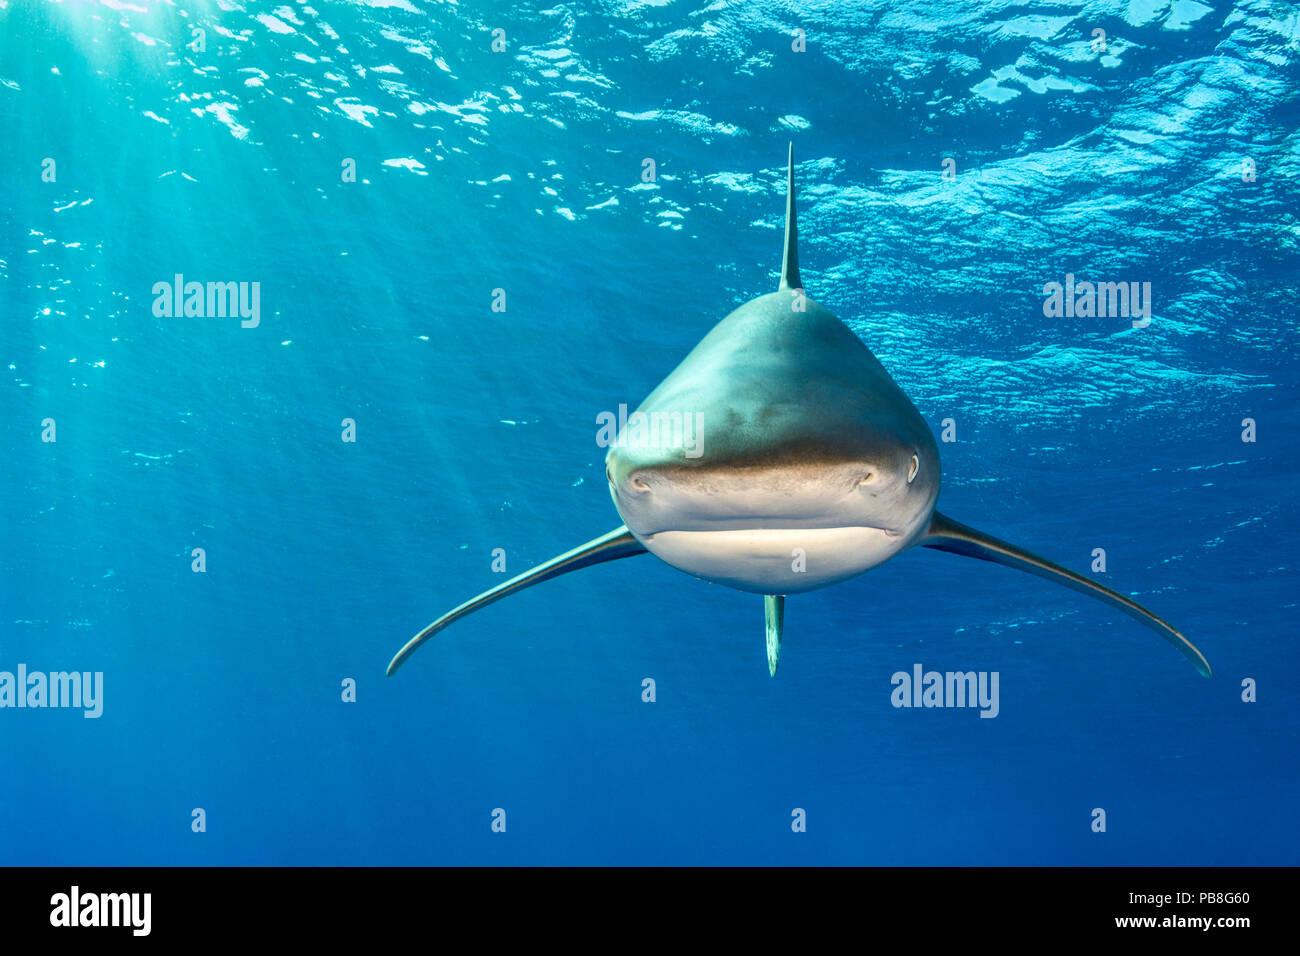 Whitetip (Carcharhinus longimanus) cabeza de debajo de la superficie. Isla rocosa, Egipto. Mar rojo Imagen De Stock